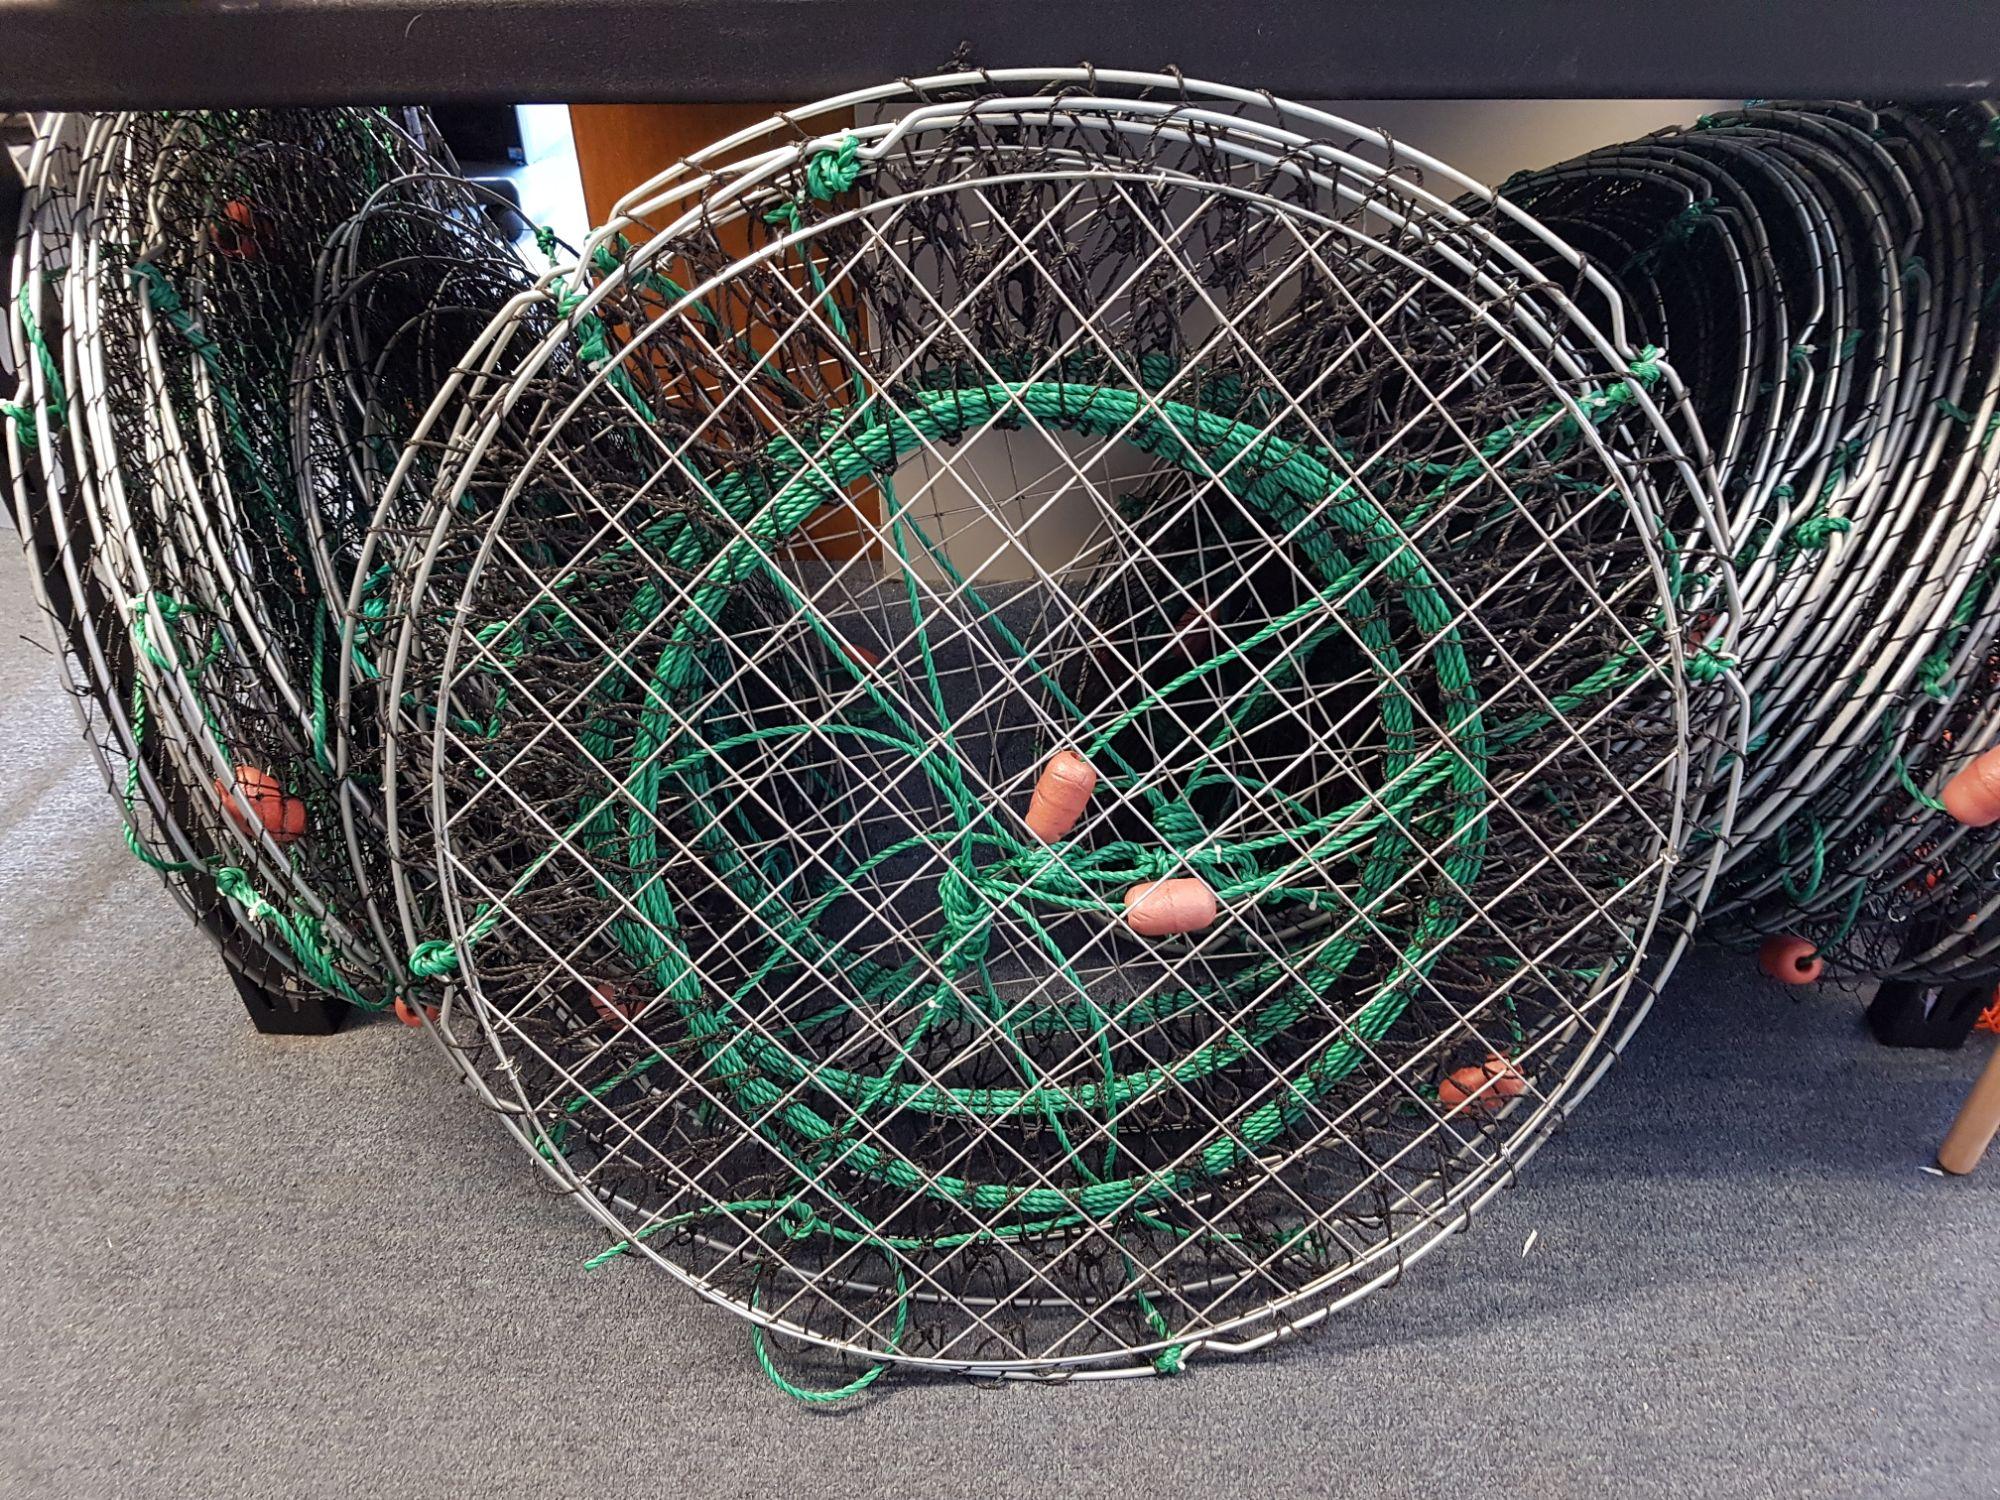 Crabbing Equipment  For Sale in Perth, Western Australia